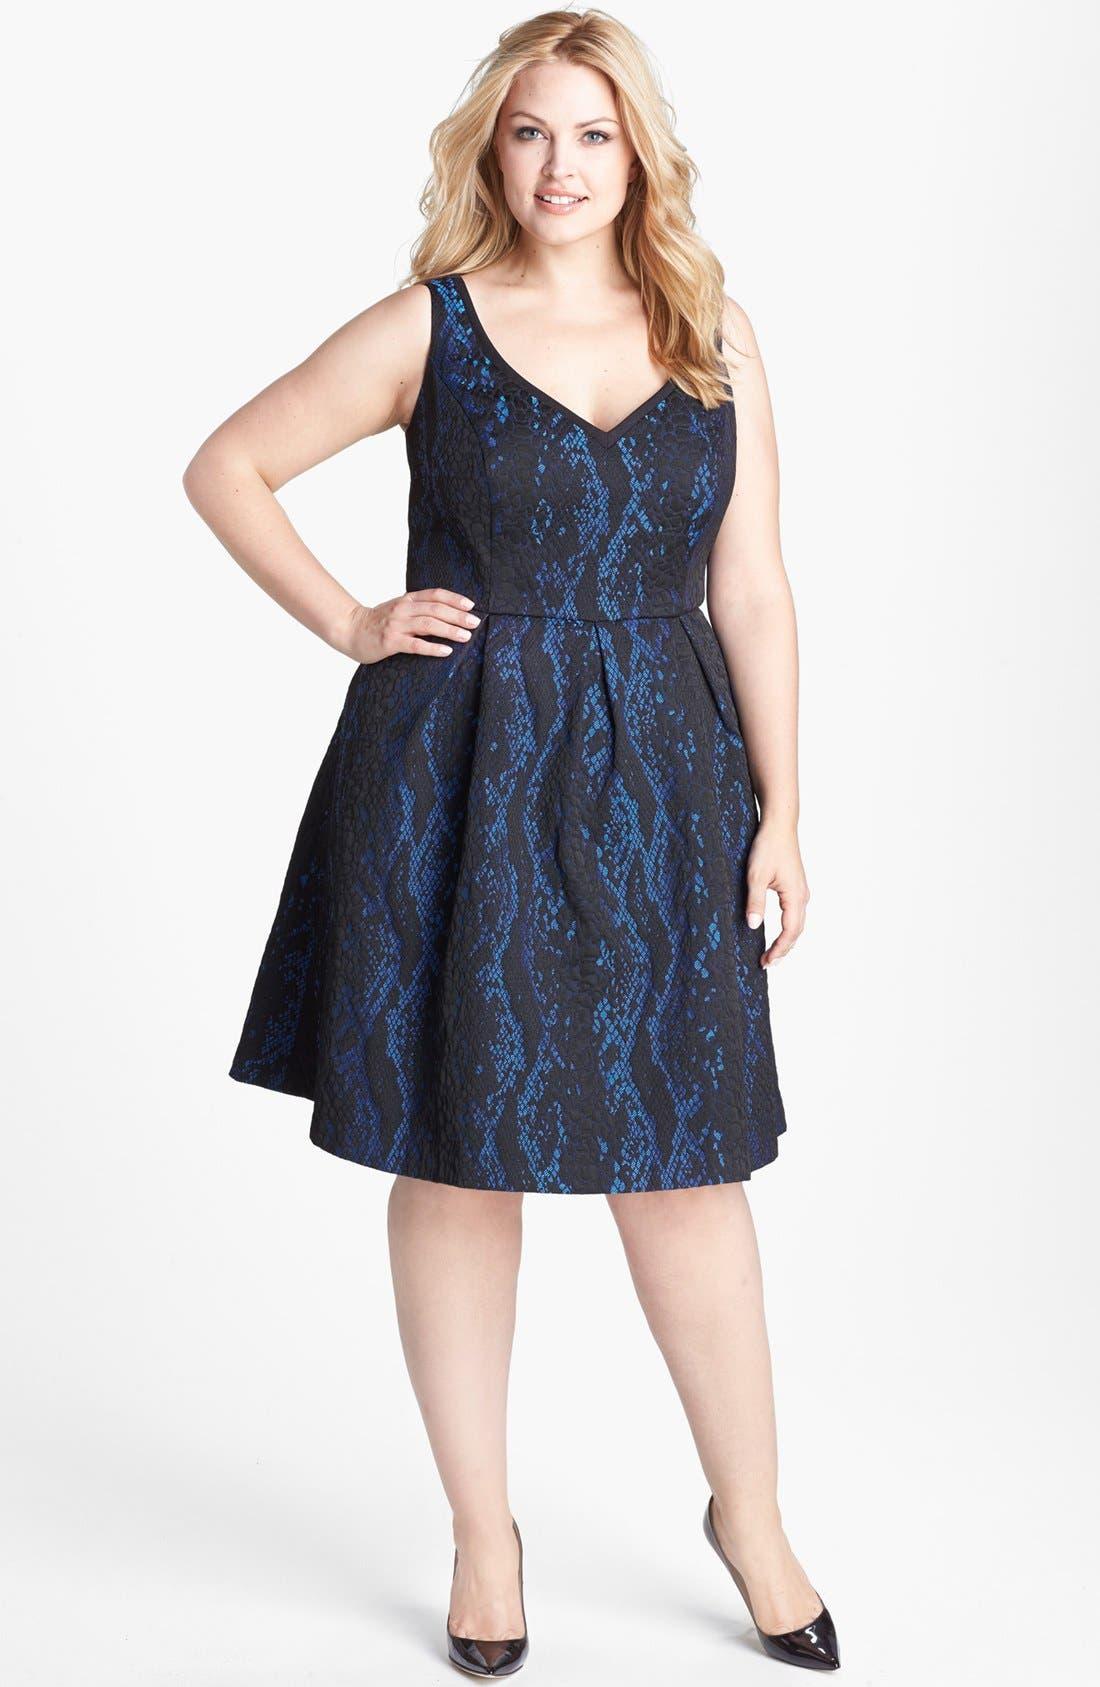 Main Image - ABS by Allen Schwartz Python Jacquard Cocktail Dress (Plus Size)